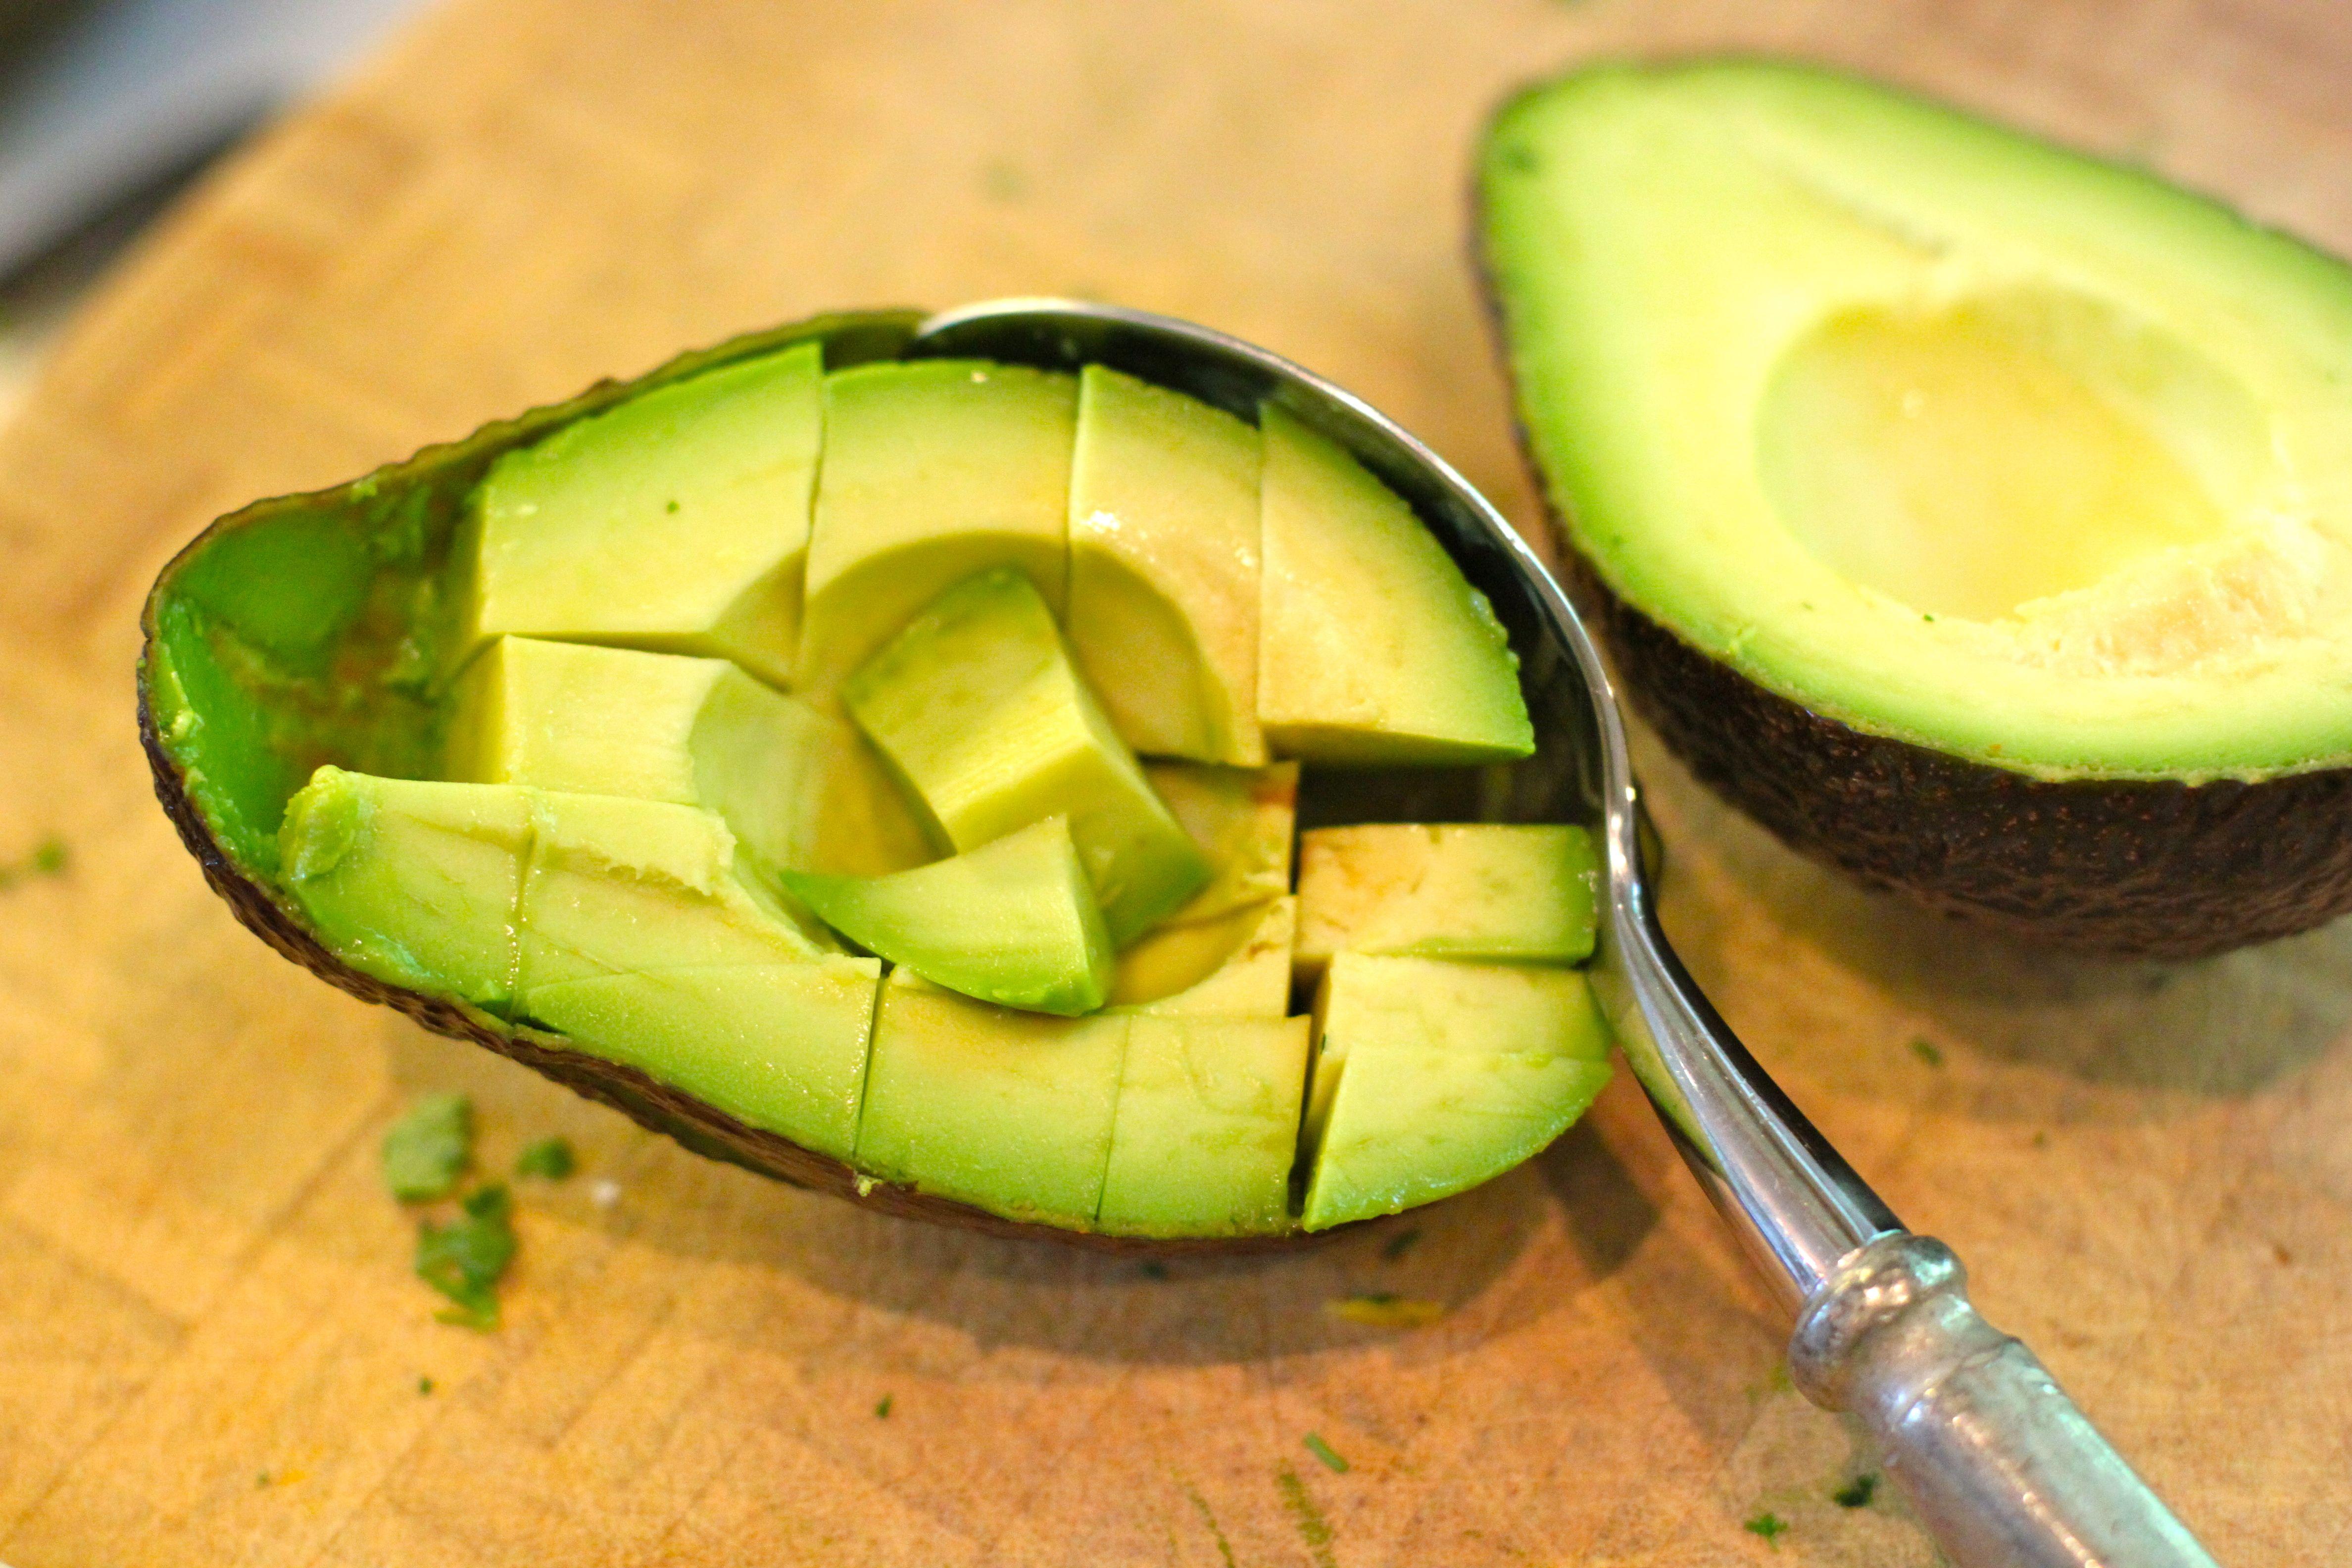 How to Pit and Cut an Avocado | Dalai Lina